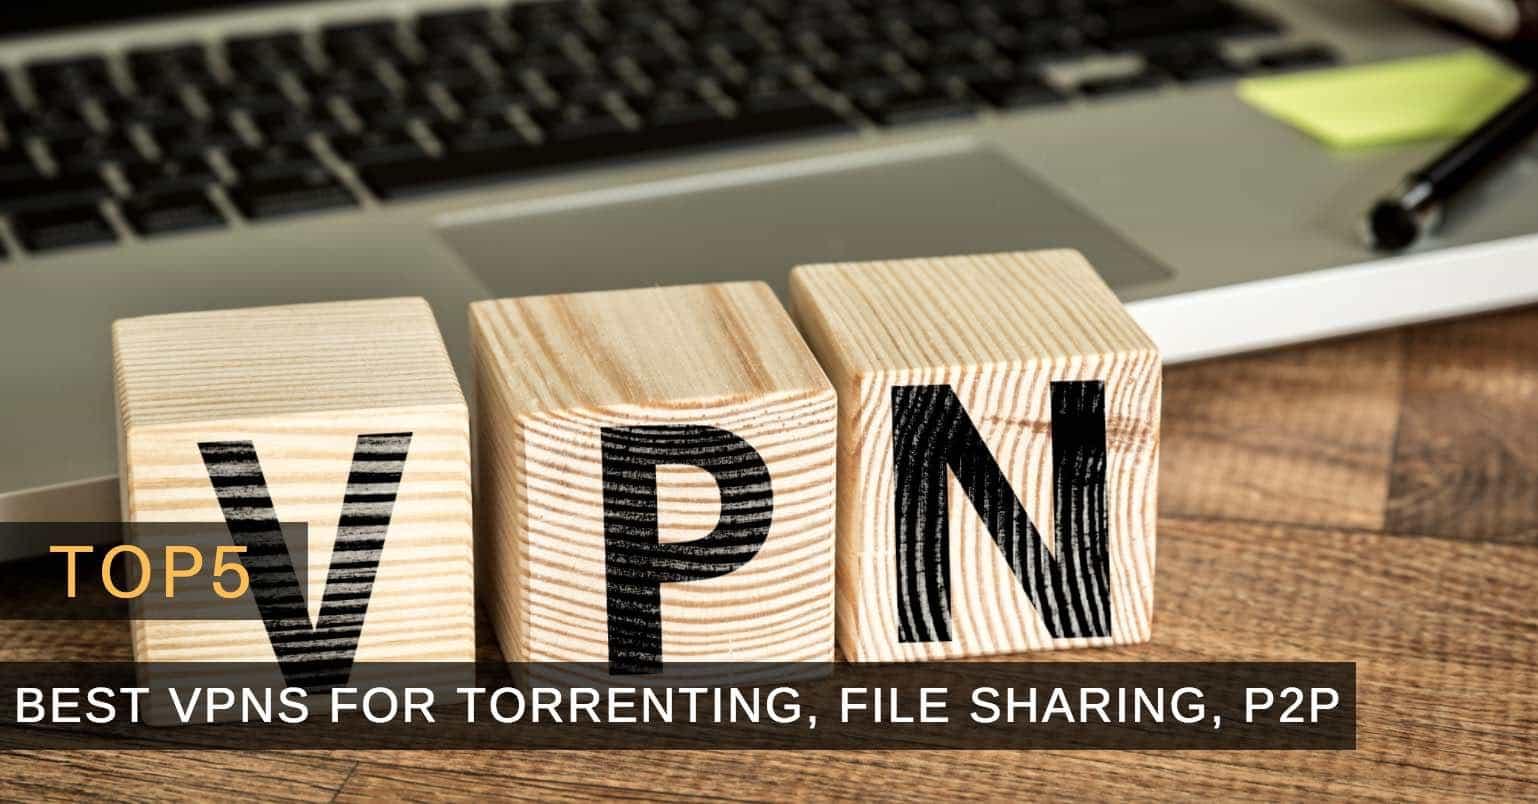 Best VPN for Torrenting in 2020